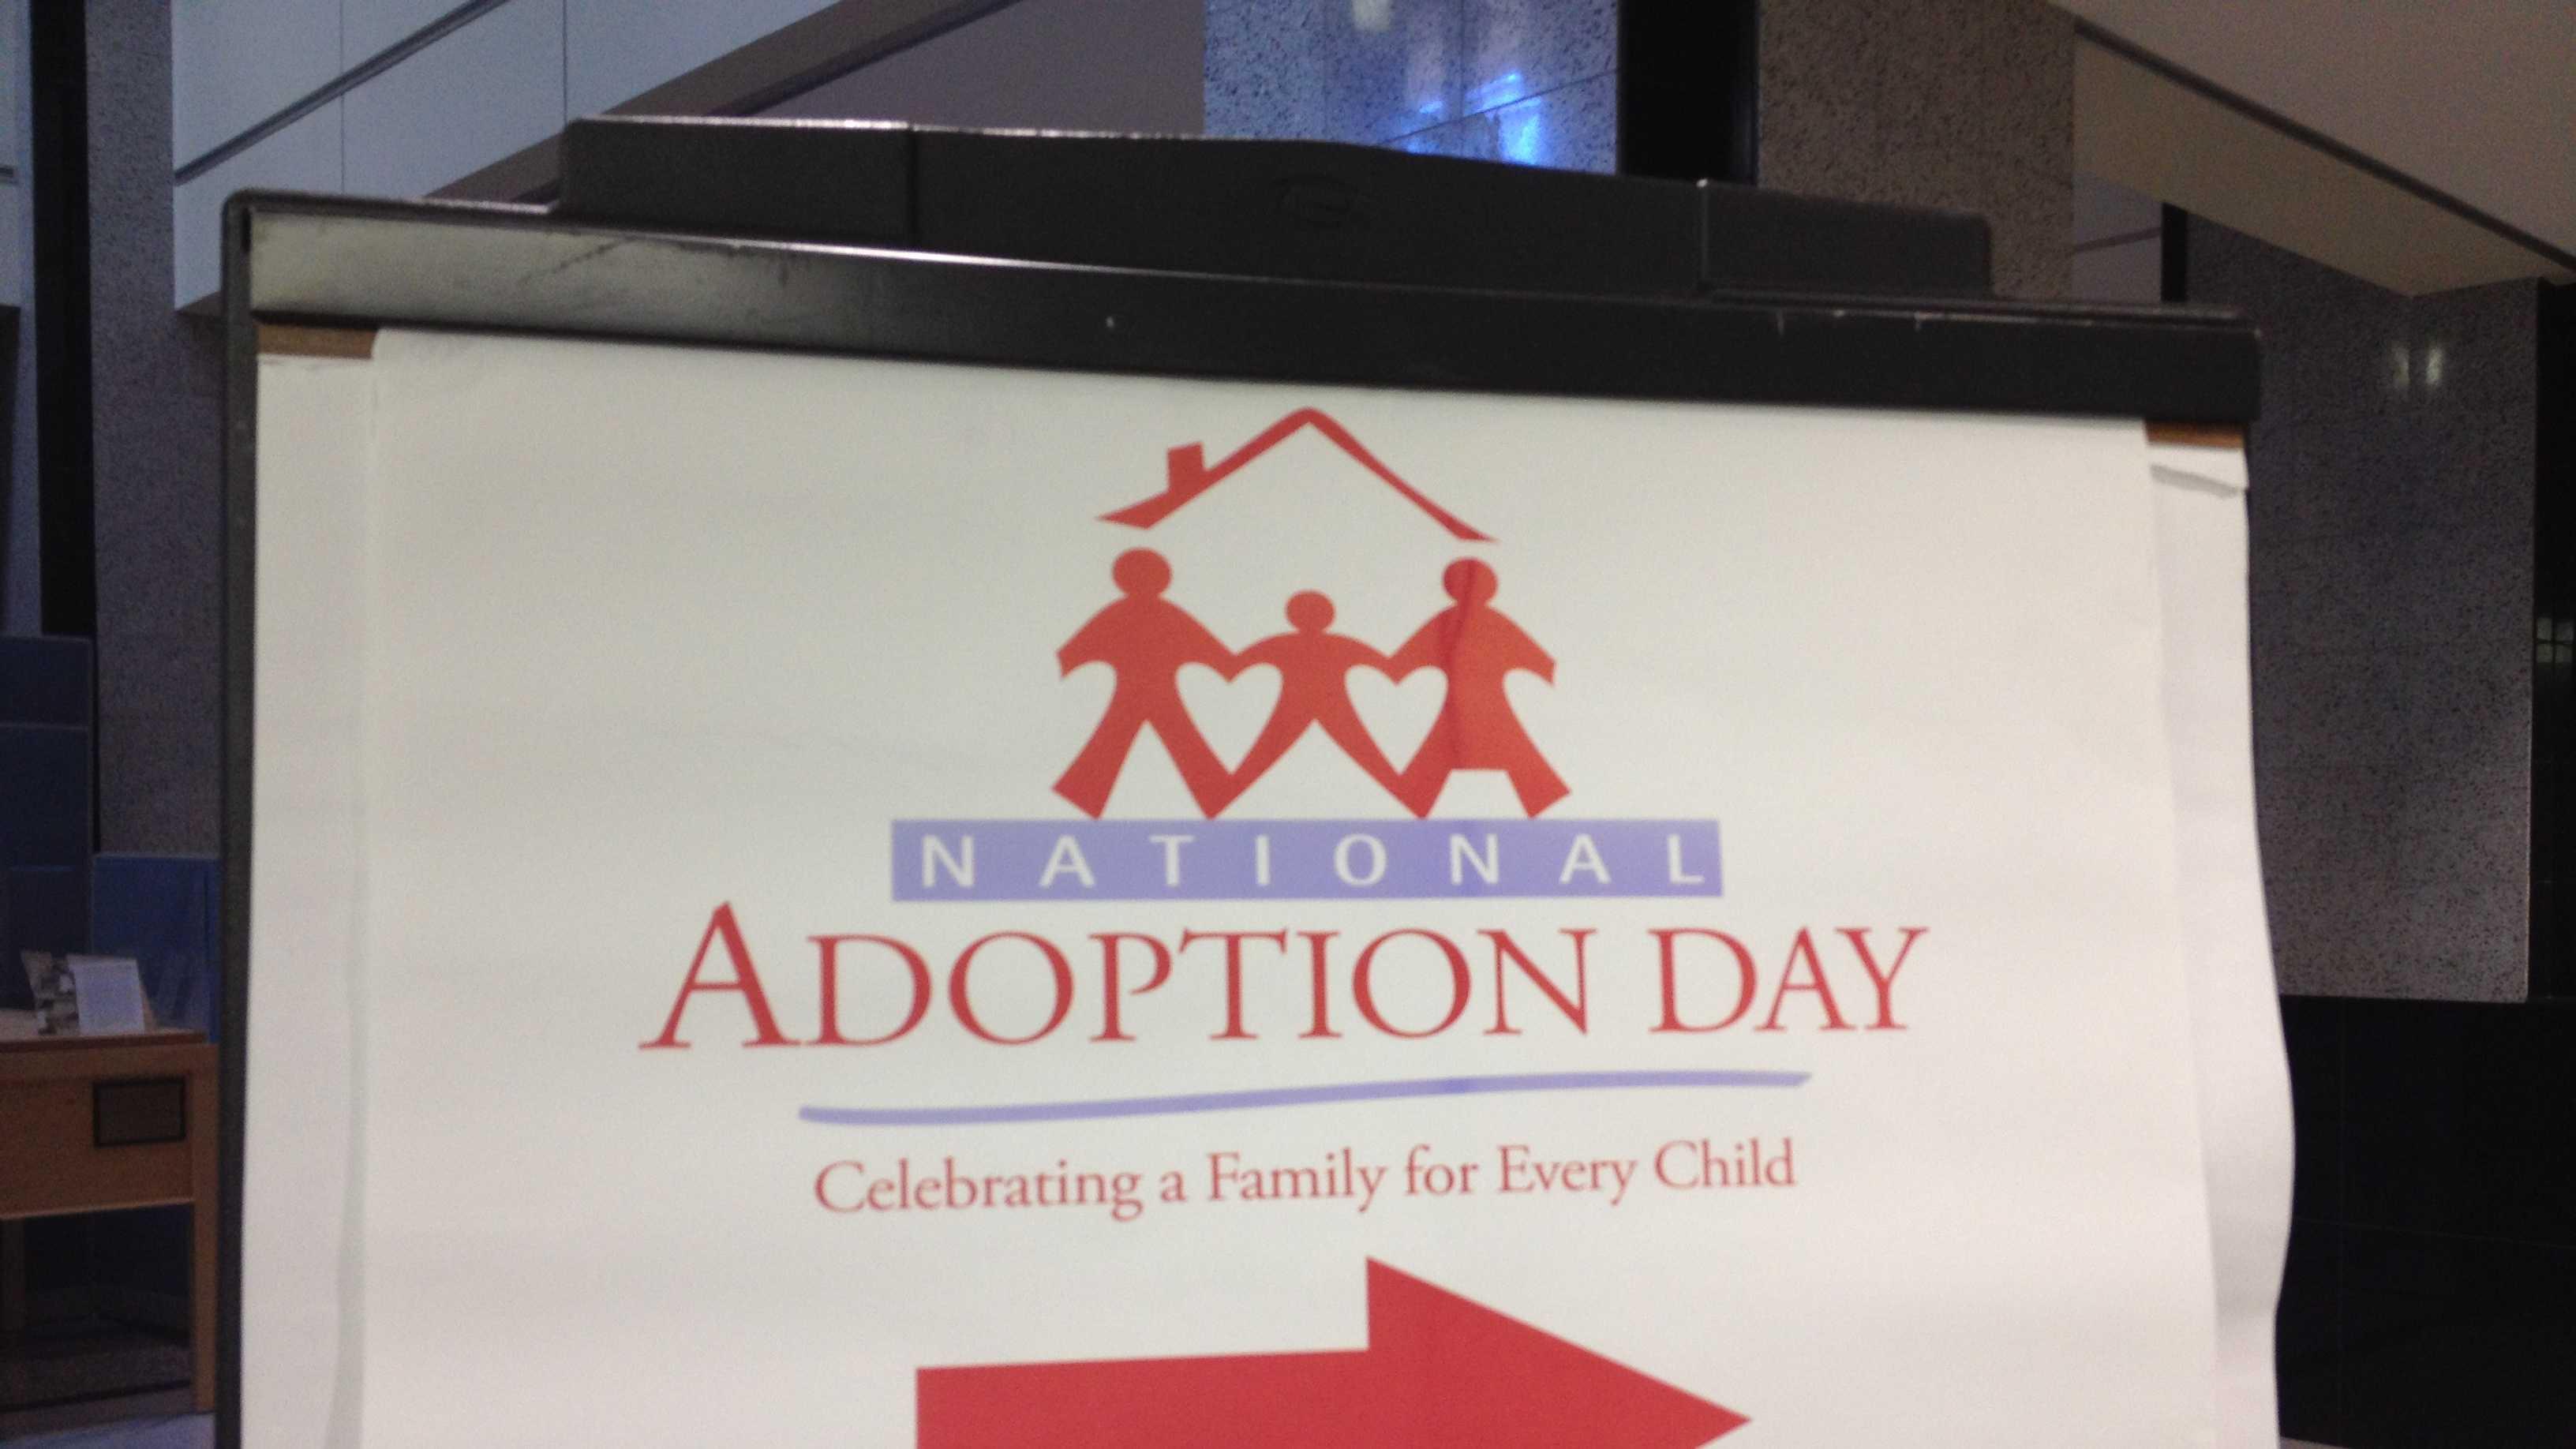 National Adoption Day sign